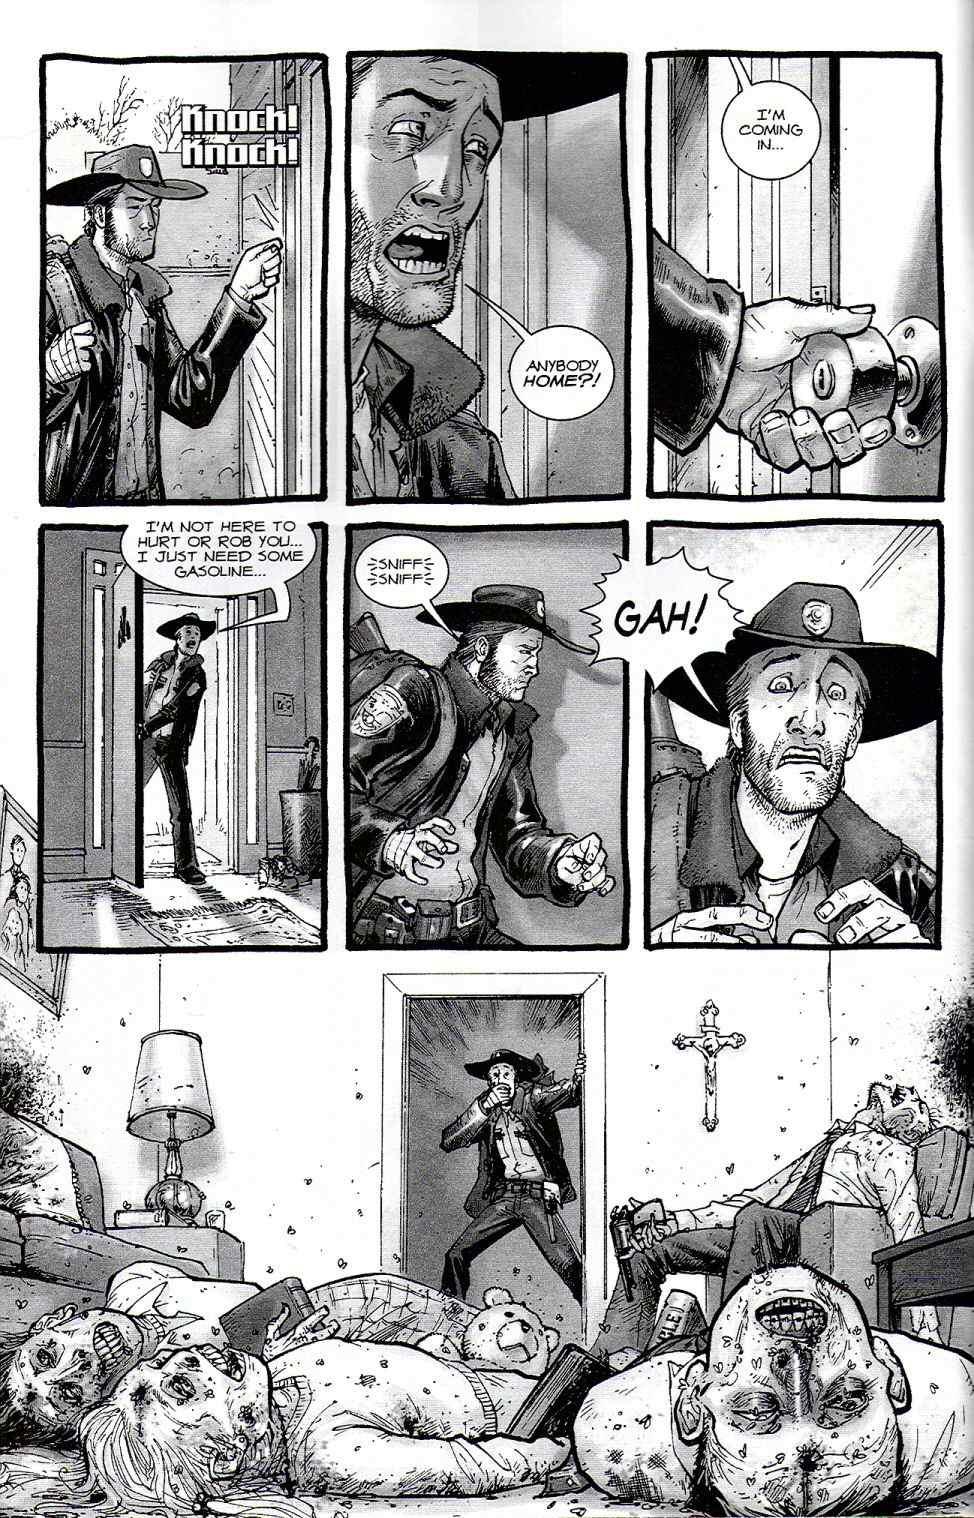 Read Comics Online Free - The Walking Dead - Chapter 002